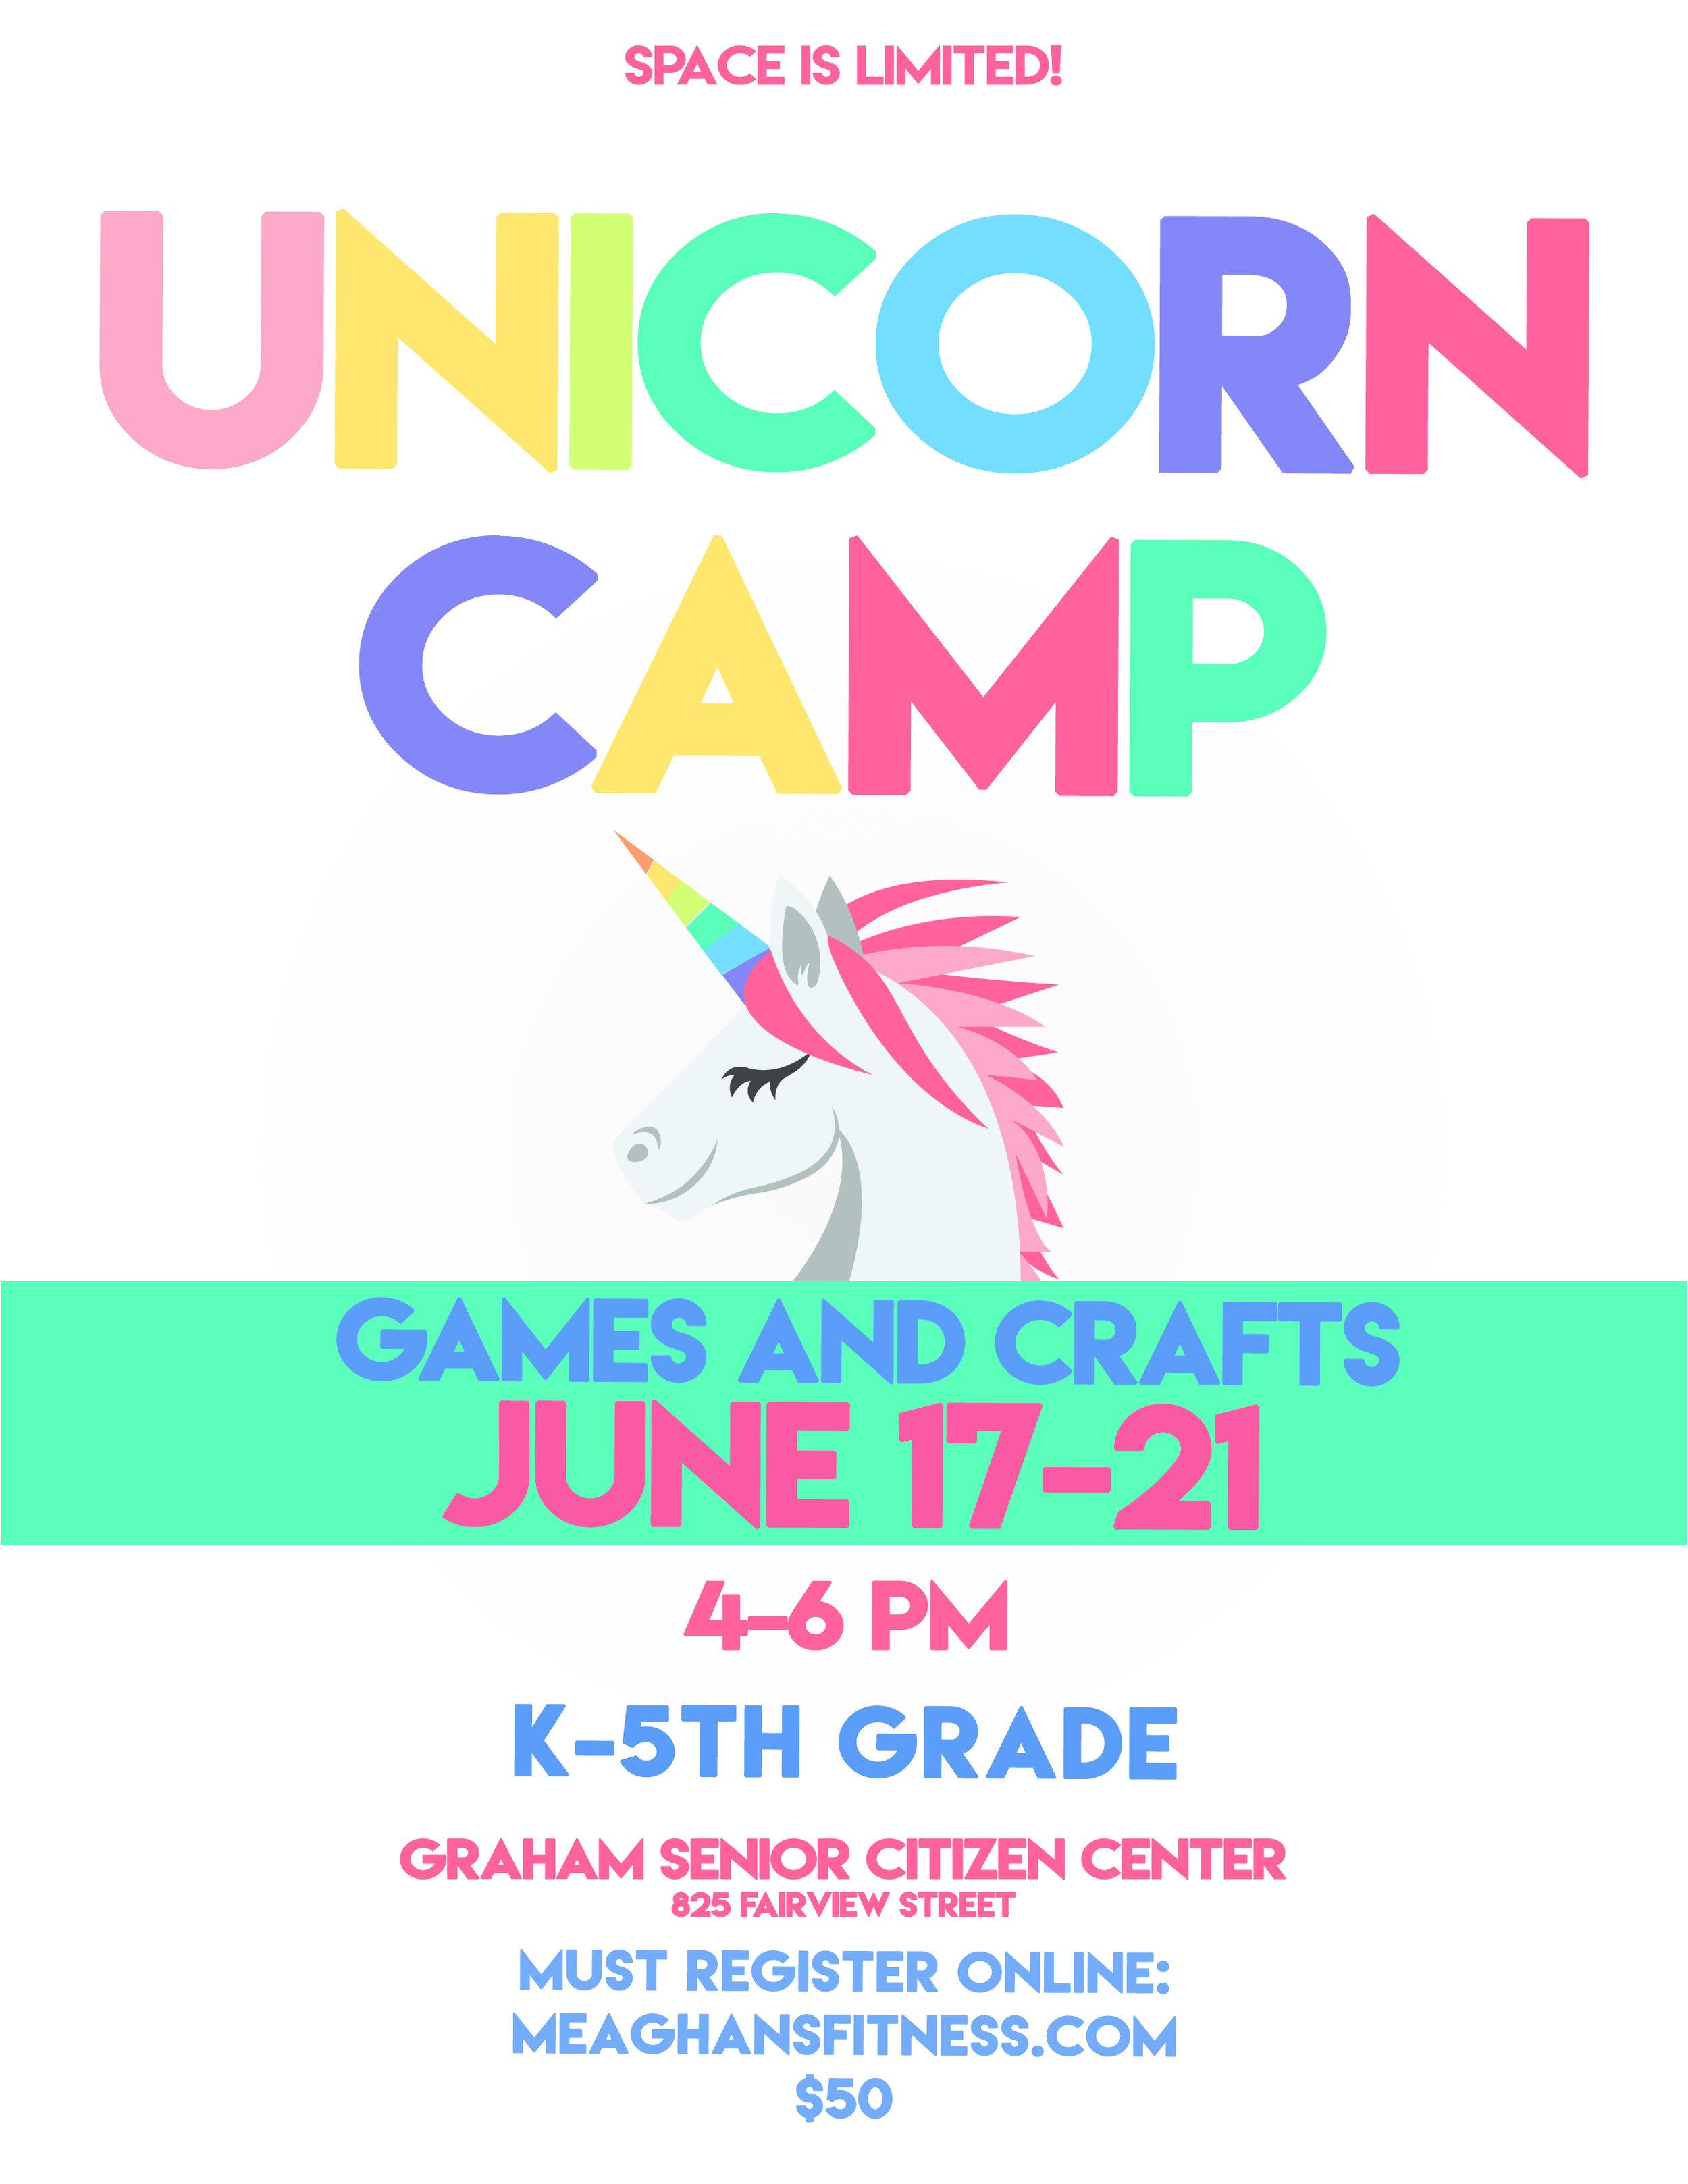 UnicornCamp.jpg